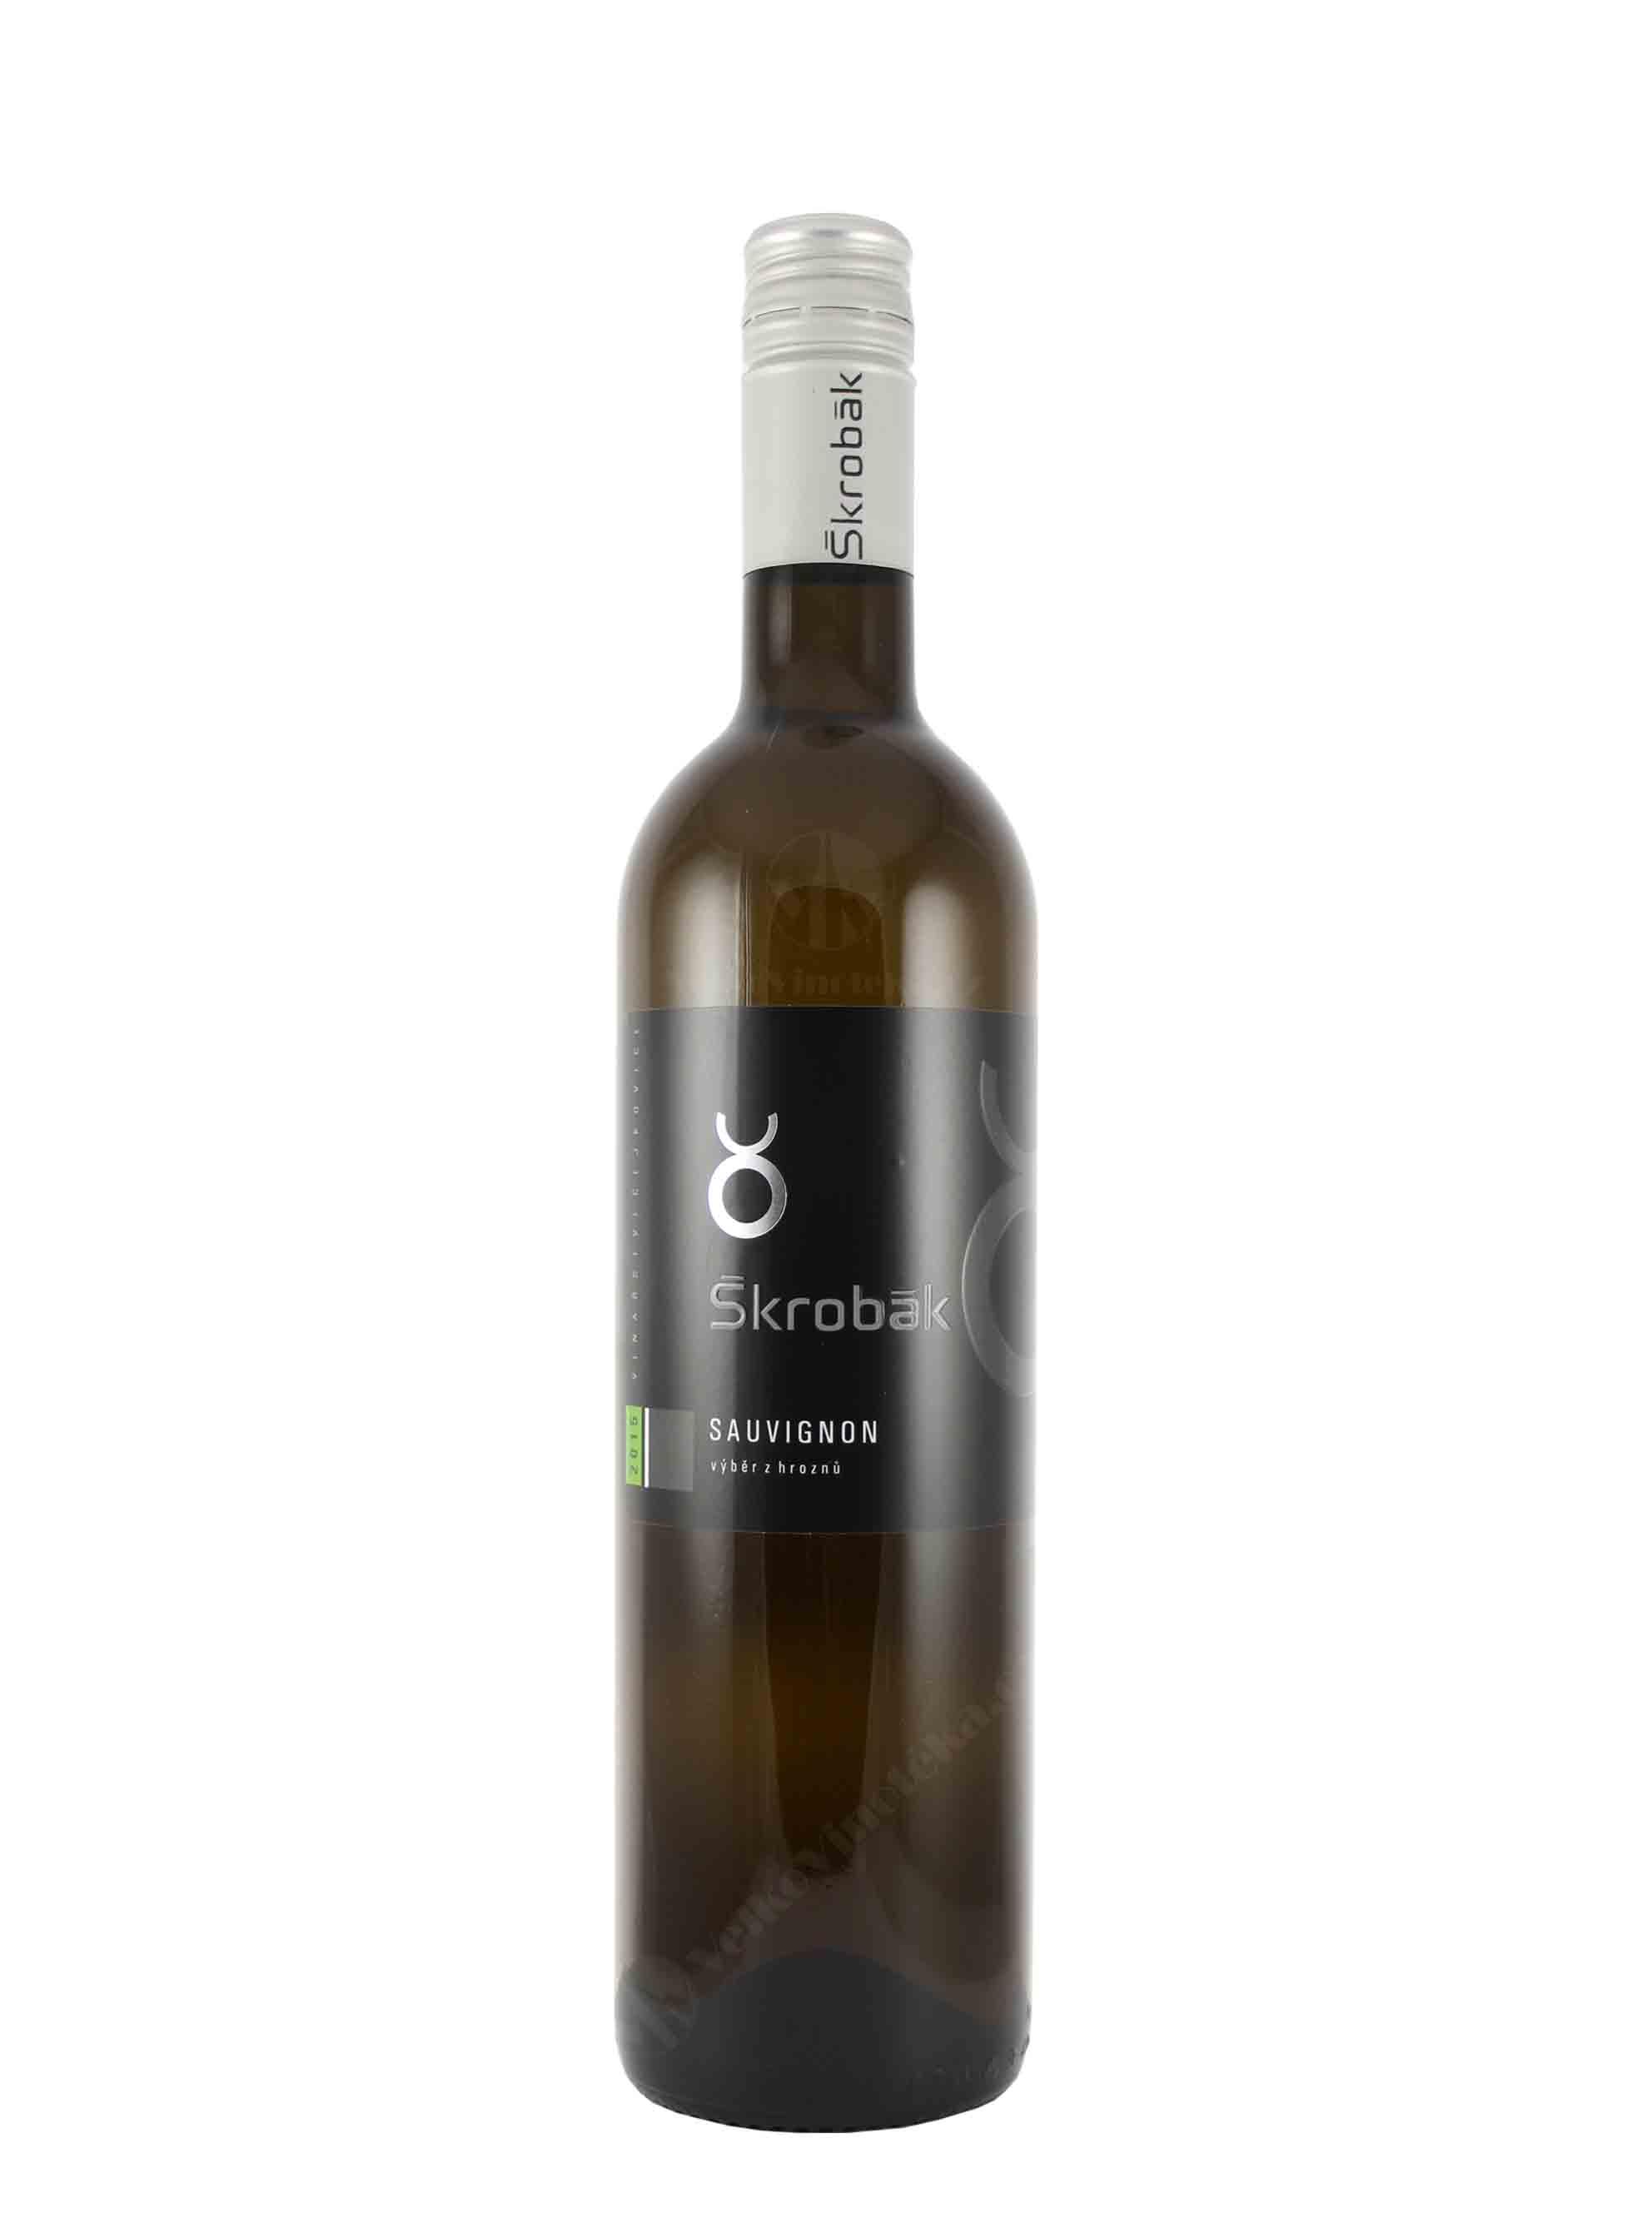 Sauvignon, Výběr z hroznů, 2015, Vinařství Škrobák, 0.75 l